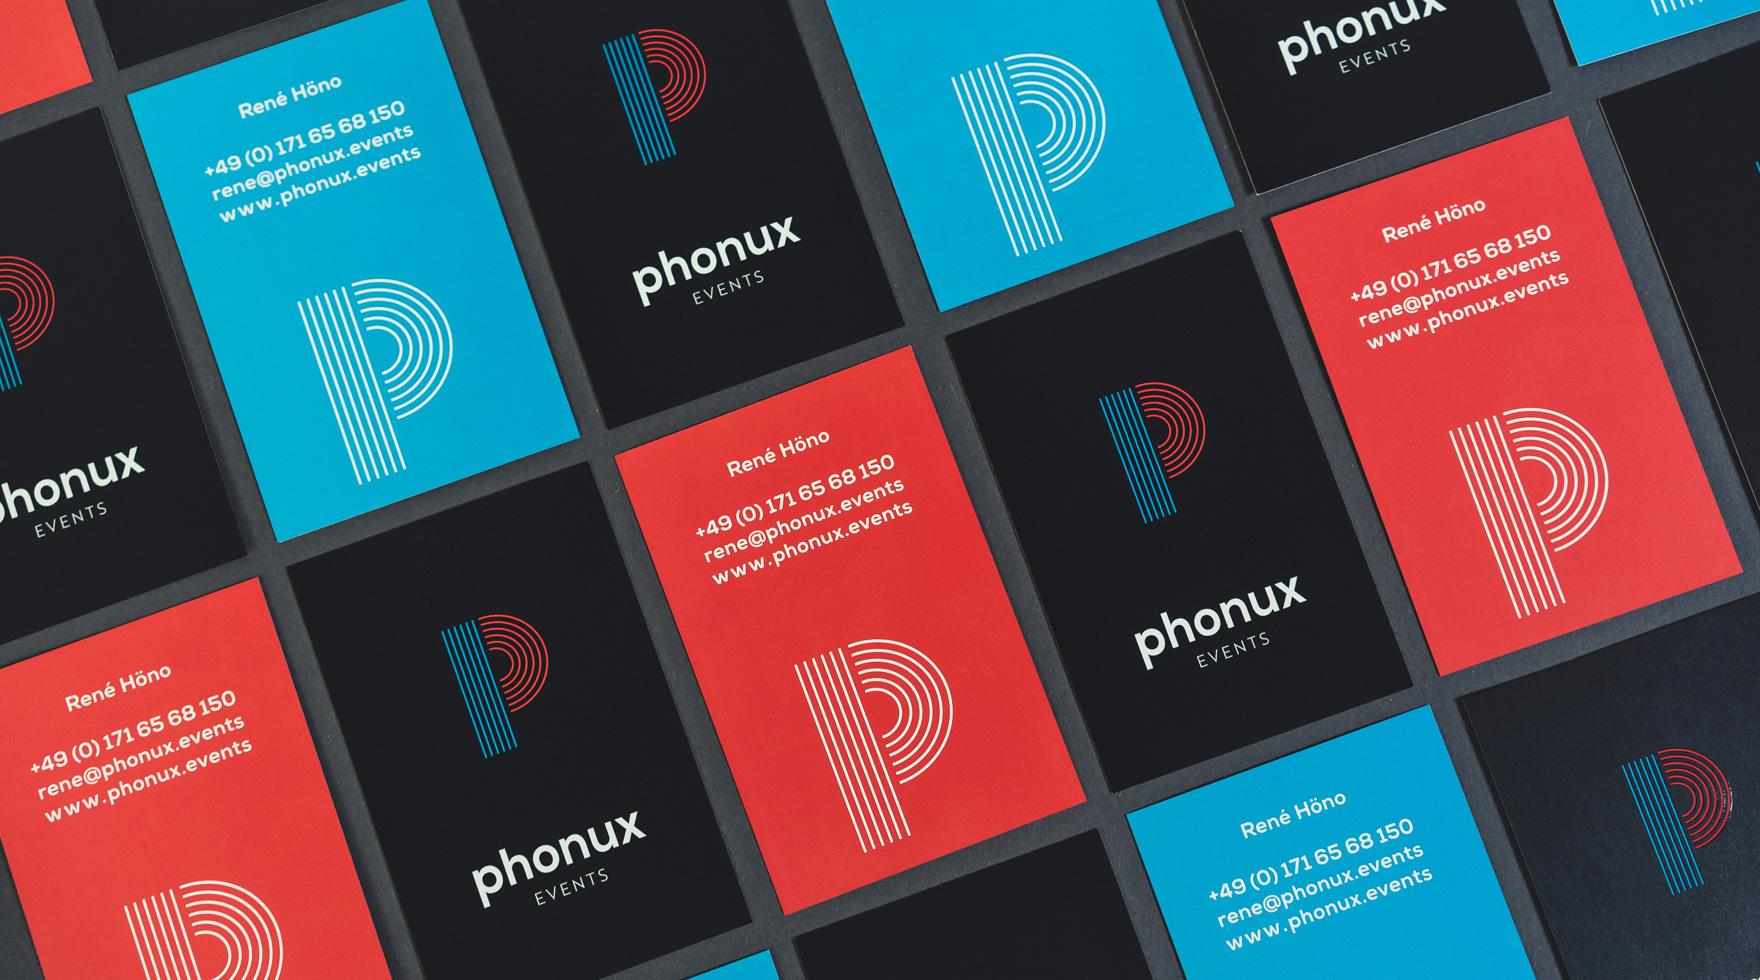 branding-phonuy-events-by-agency-webkreation